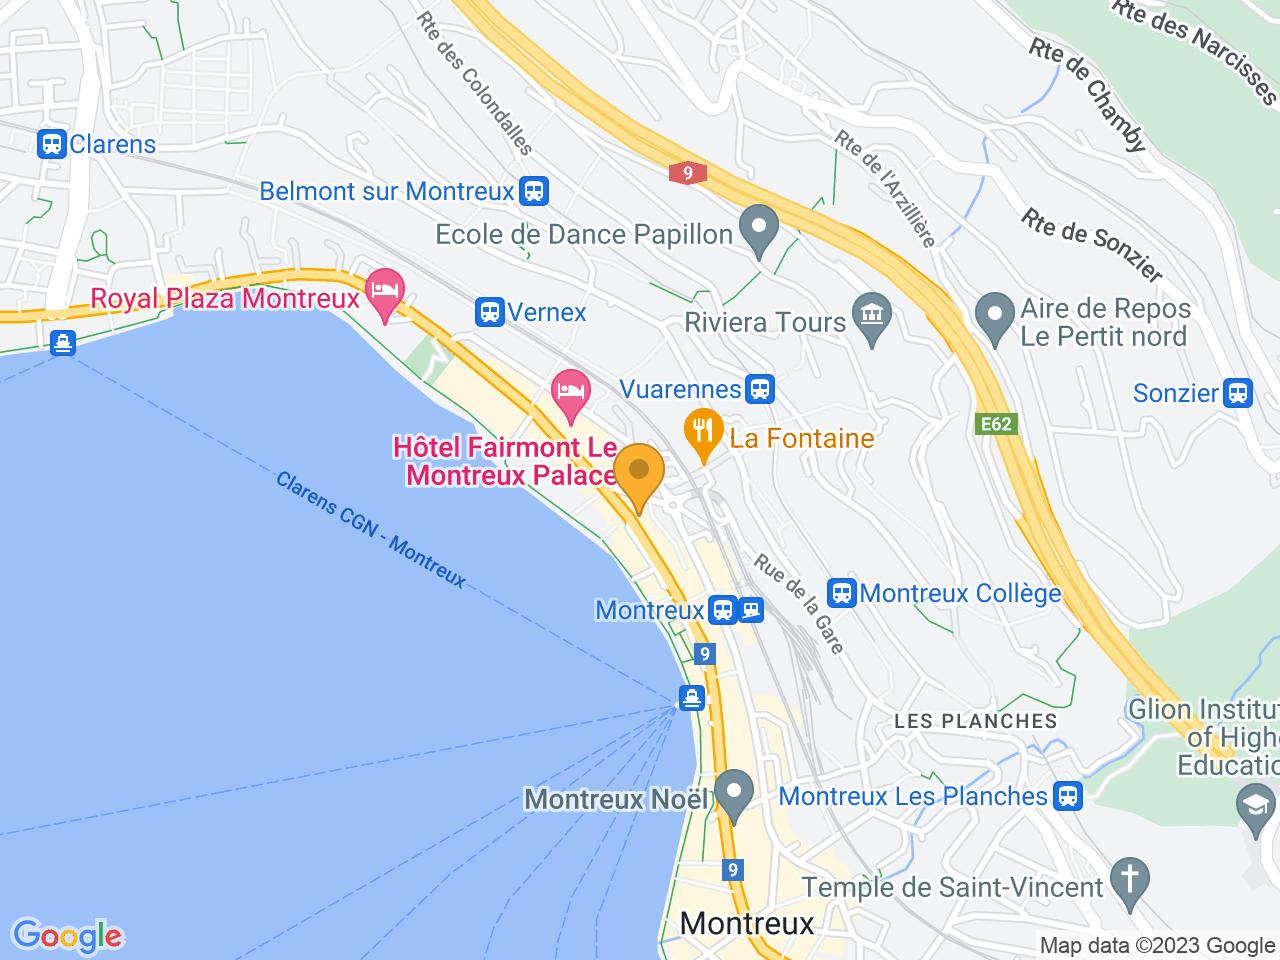 Grand Rue 92, 1820 Montreux